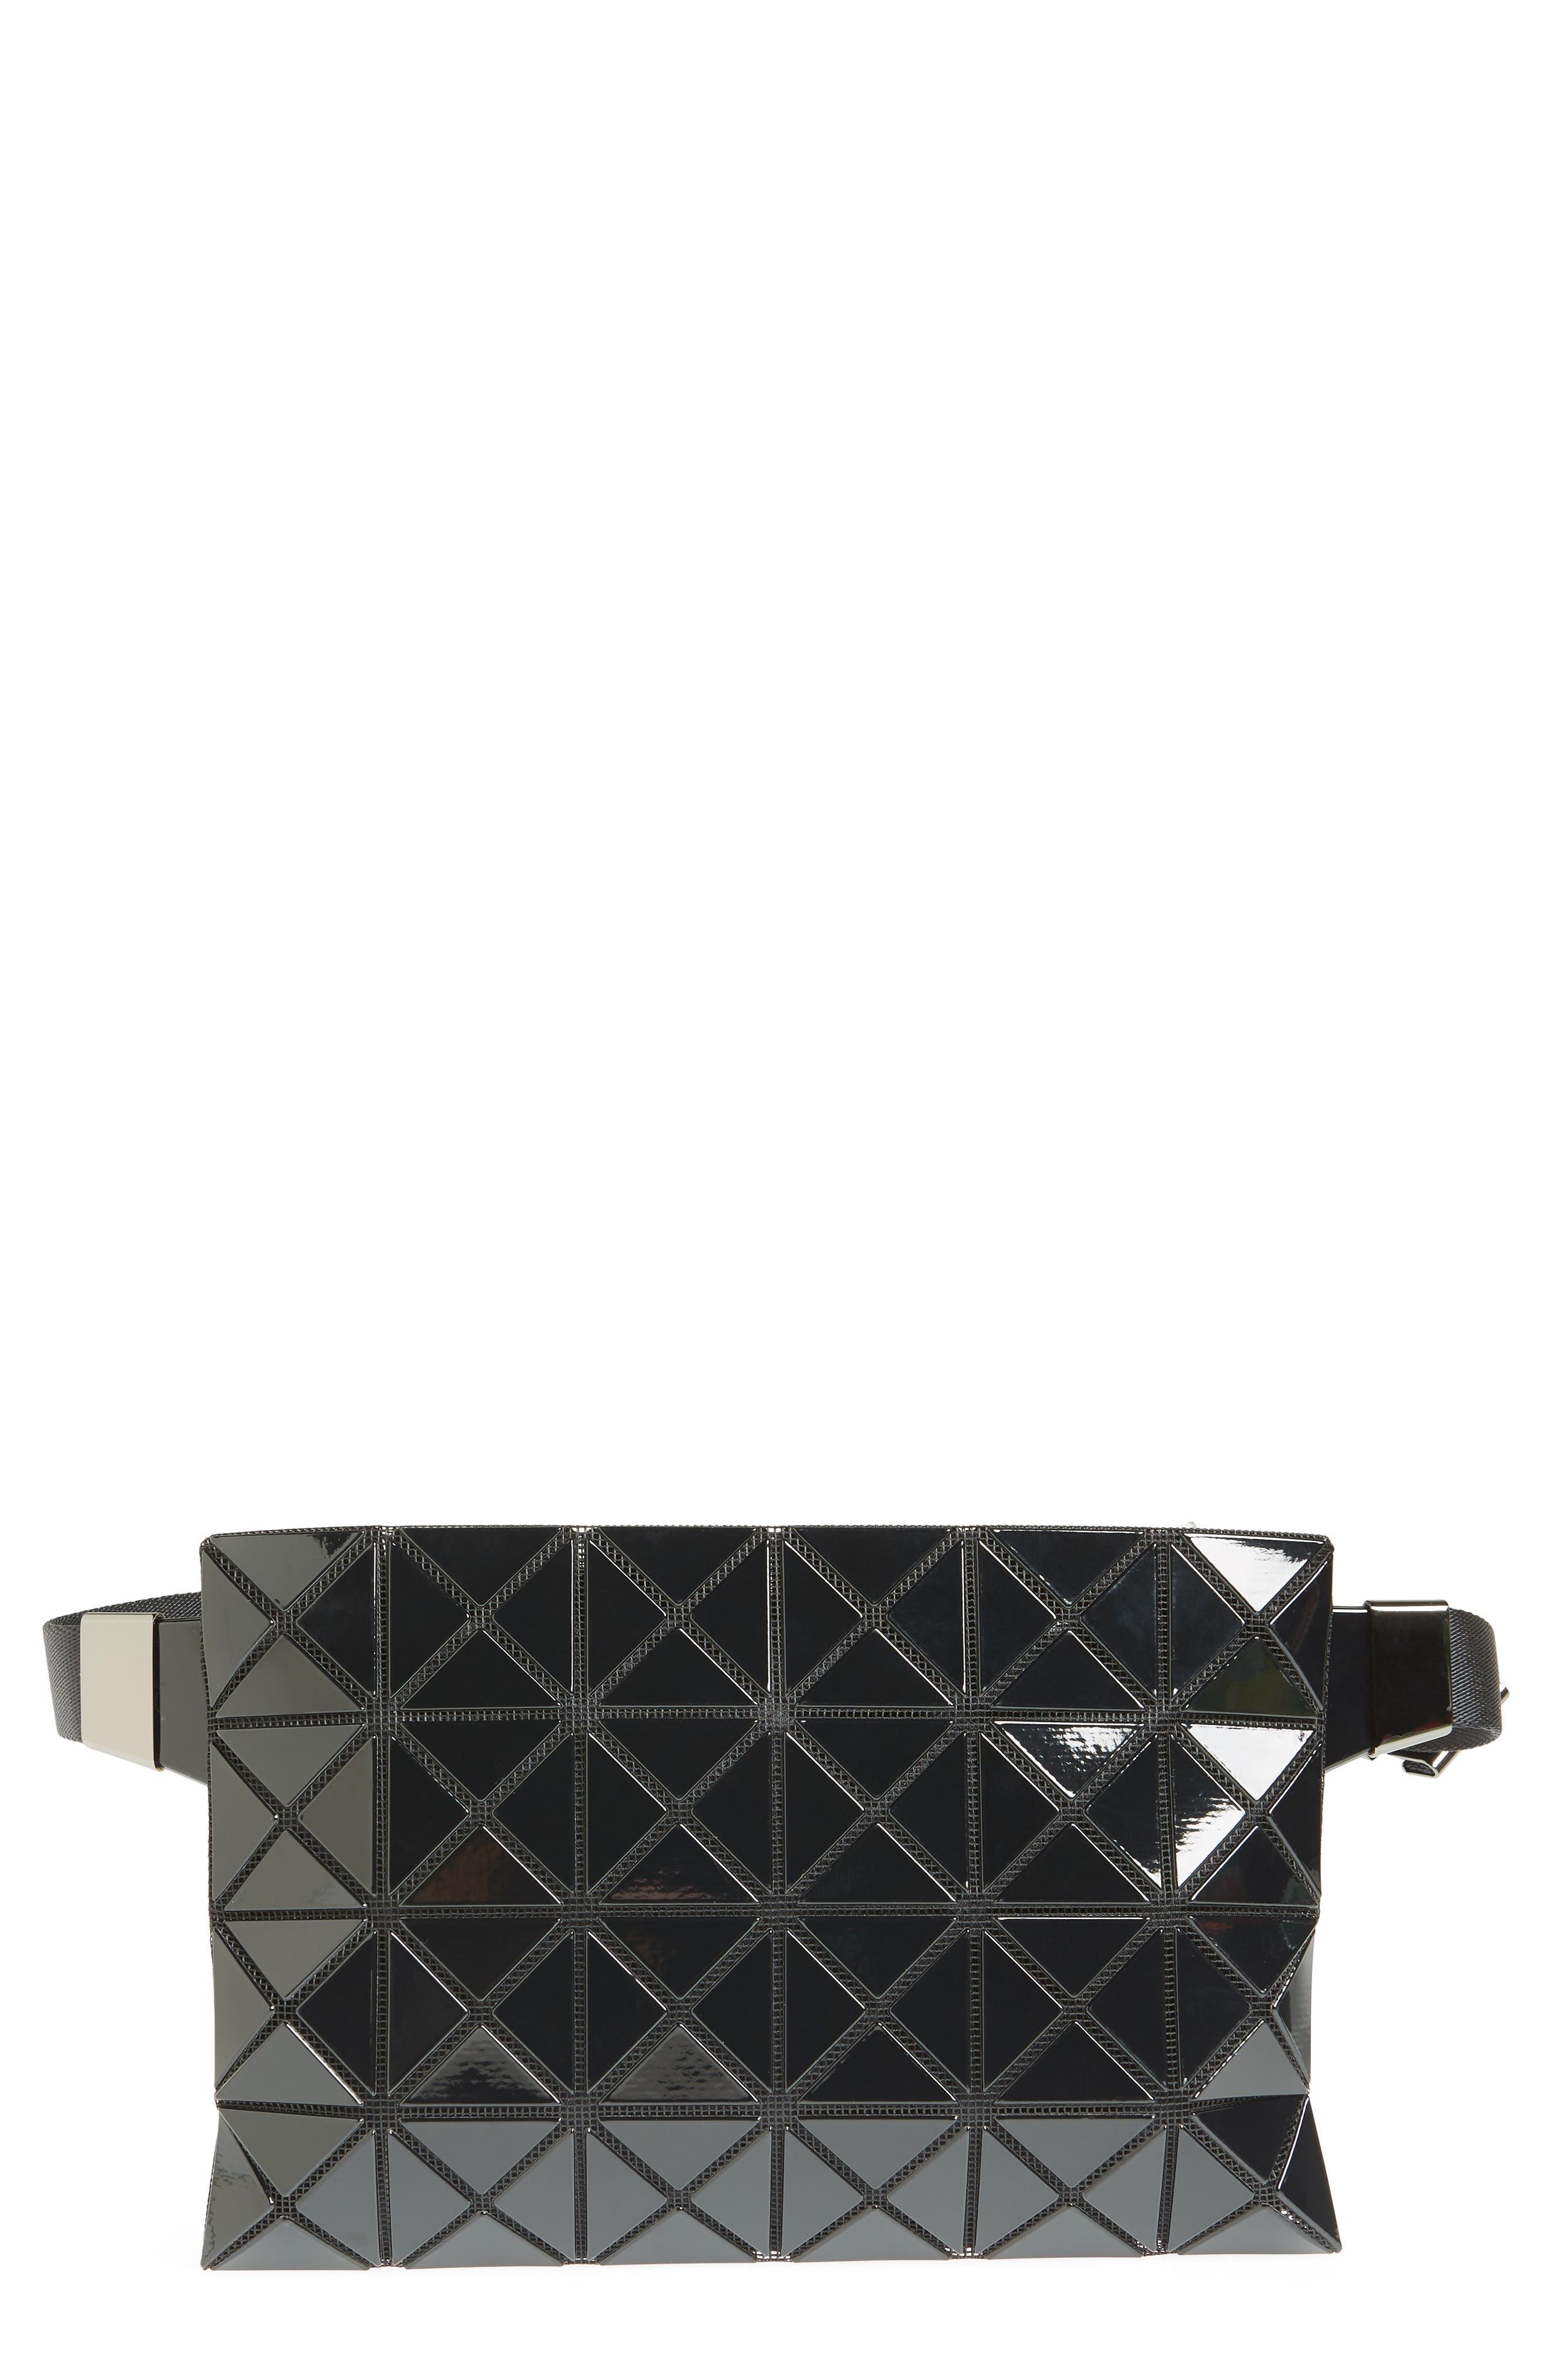 Prism Belt Bag,                             Main thumbnail 1, color,                             BLACK